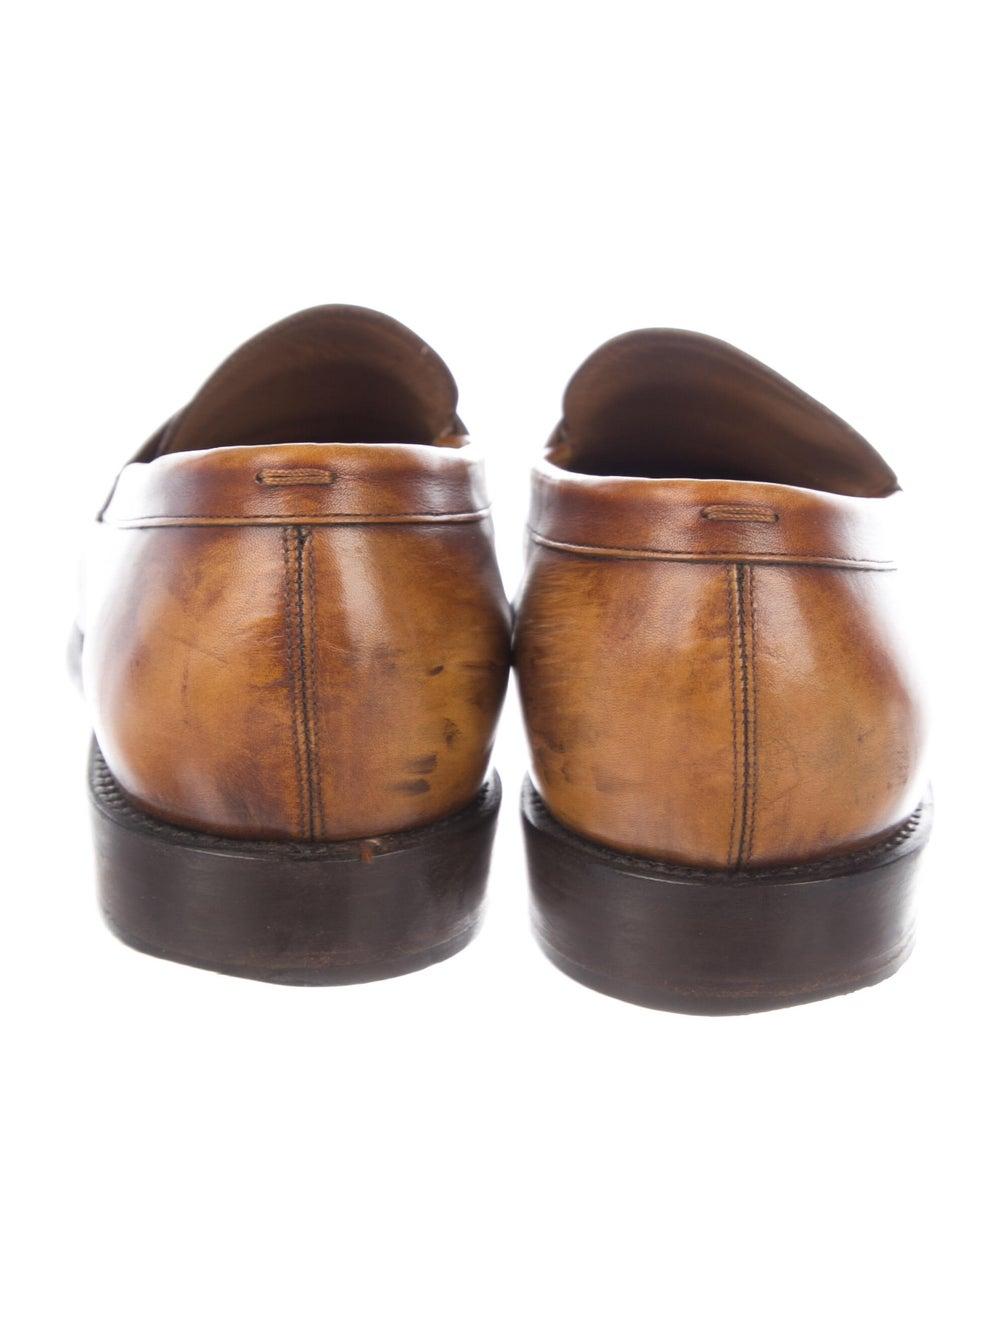 Salvatore Ferragamo Leather Penny Loafers - image 4